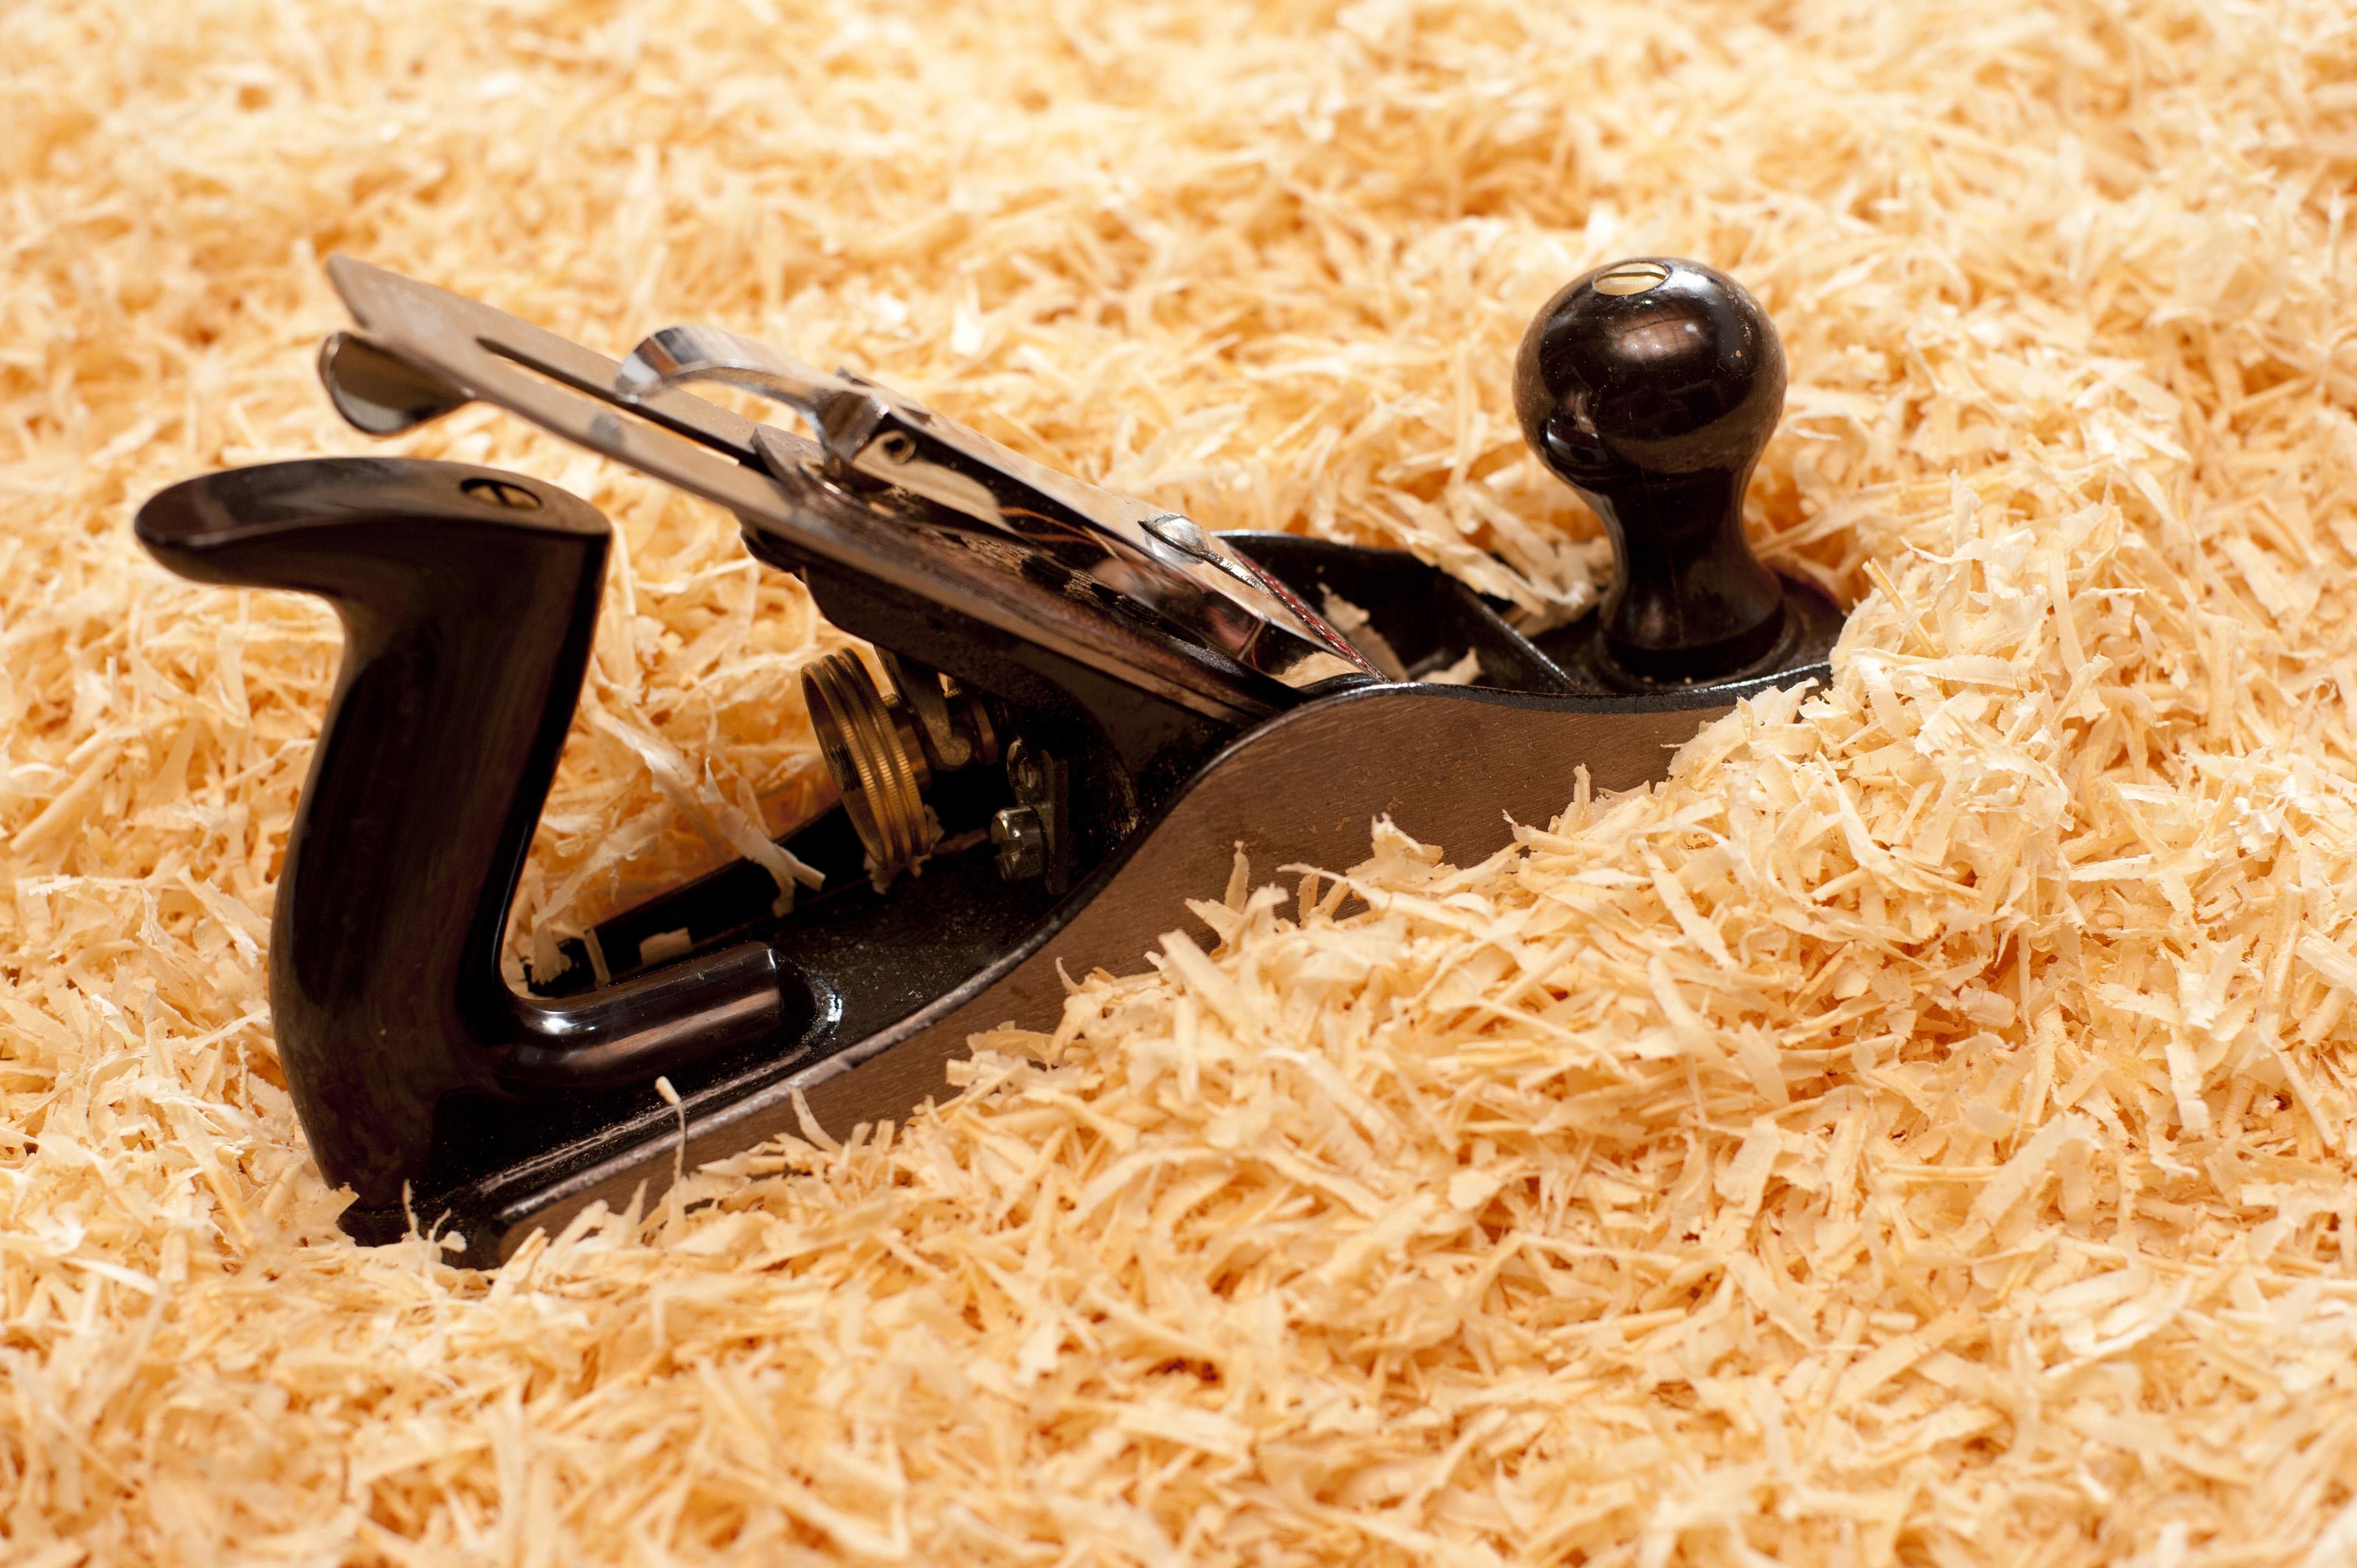 Free Stock Photo 10175 Handheld Woodworking Plane